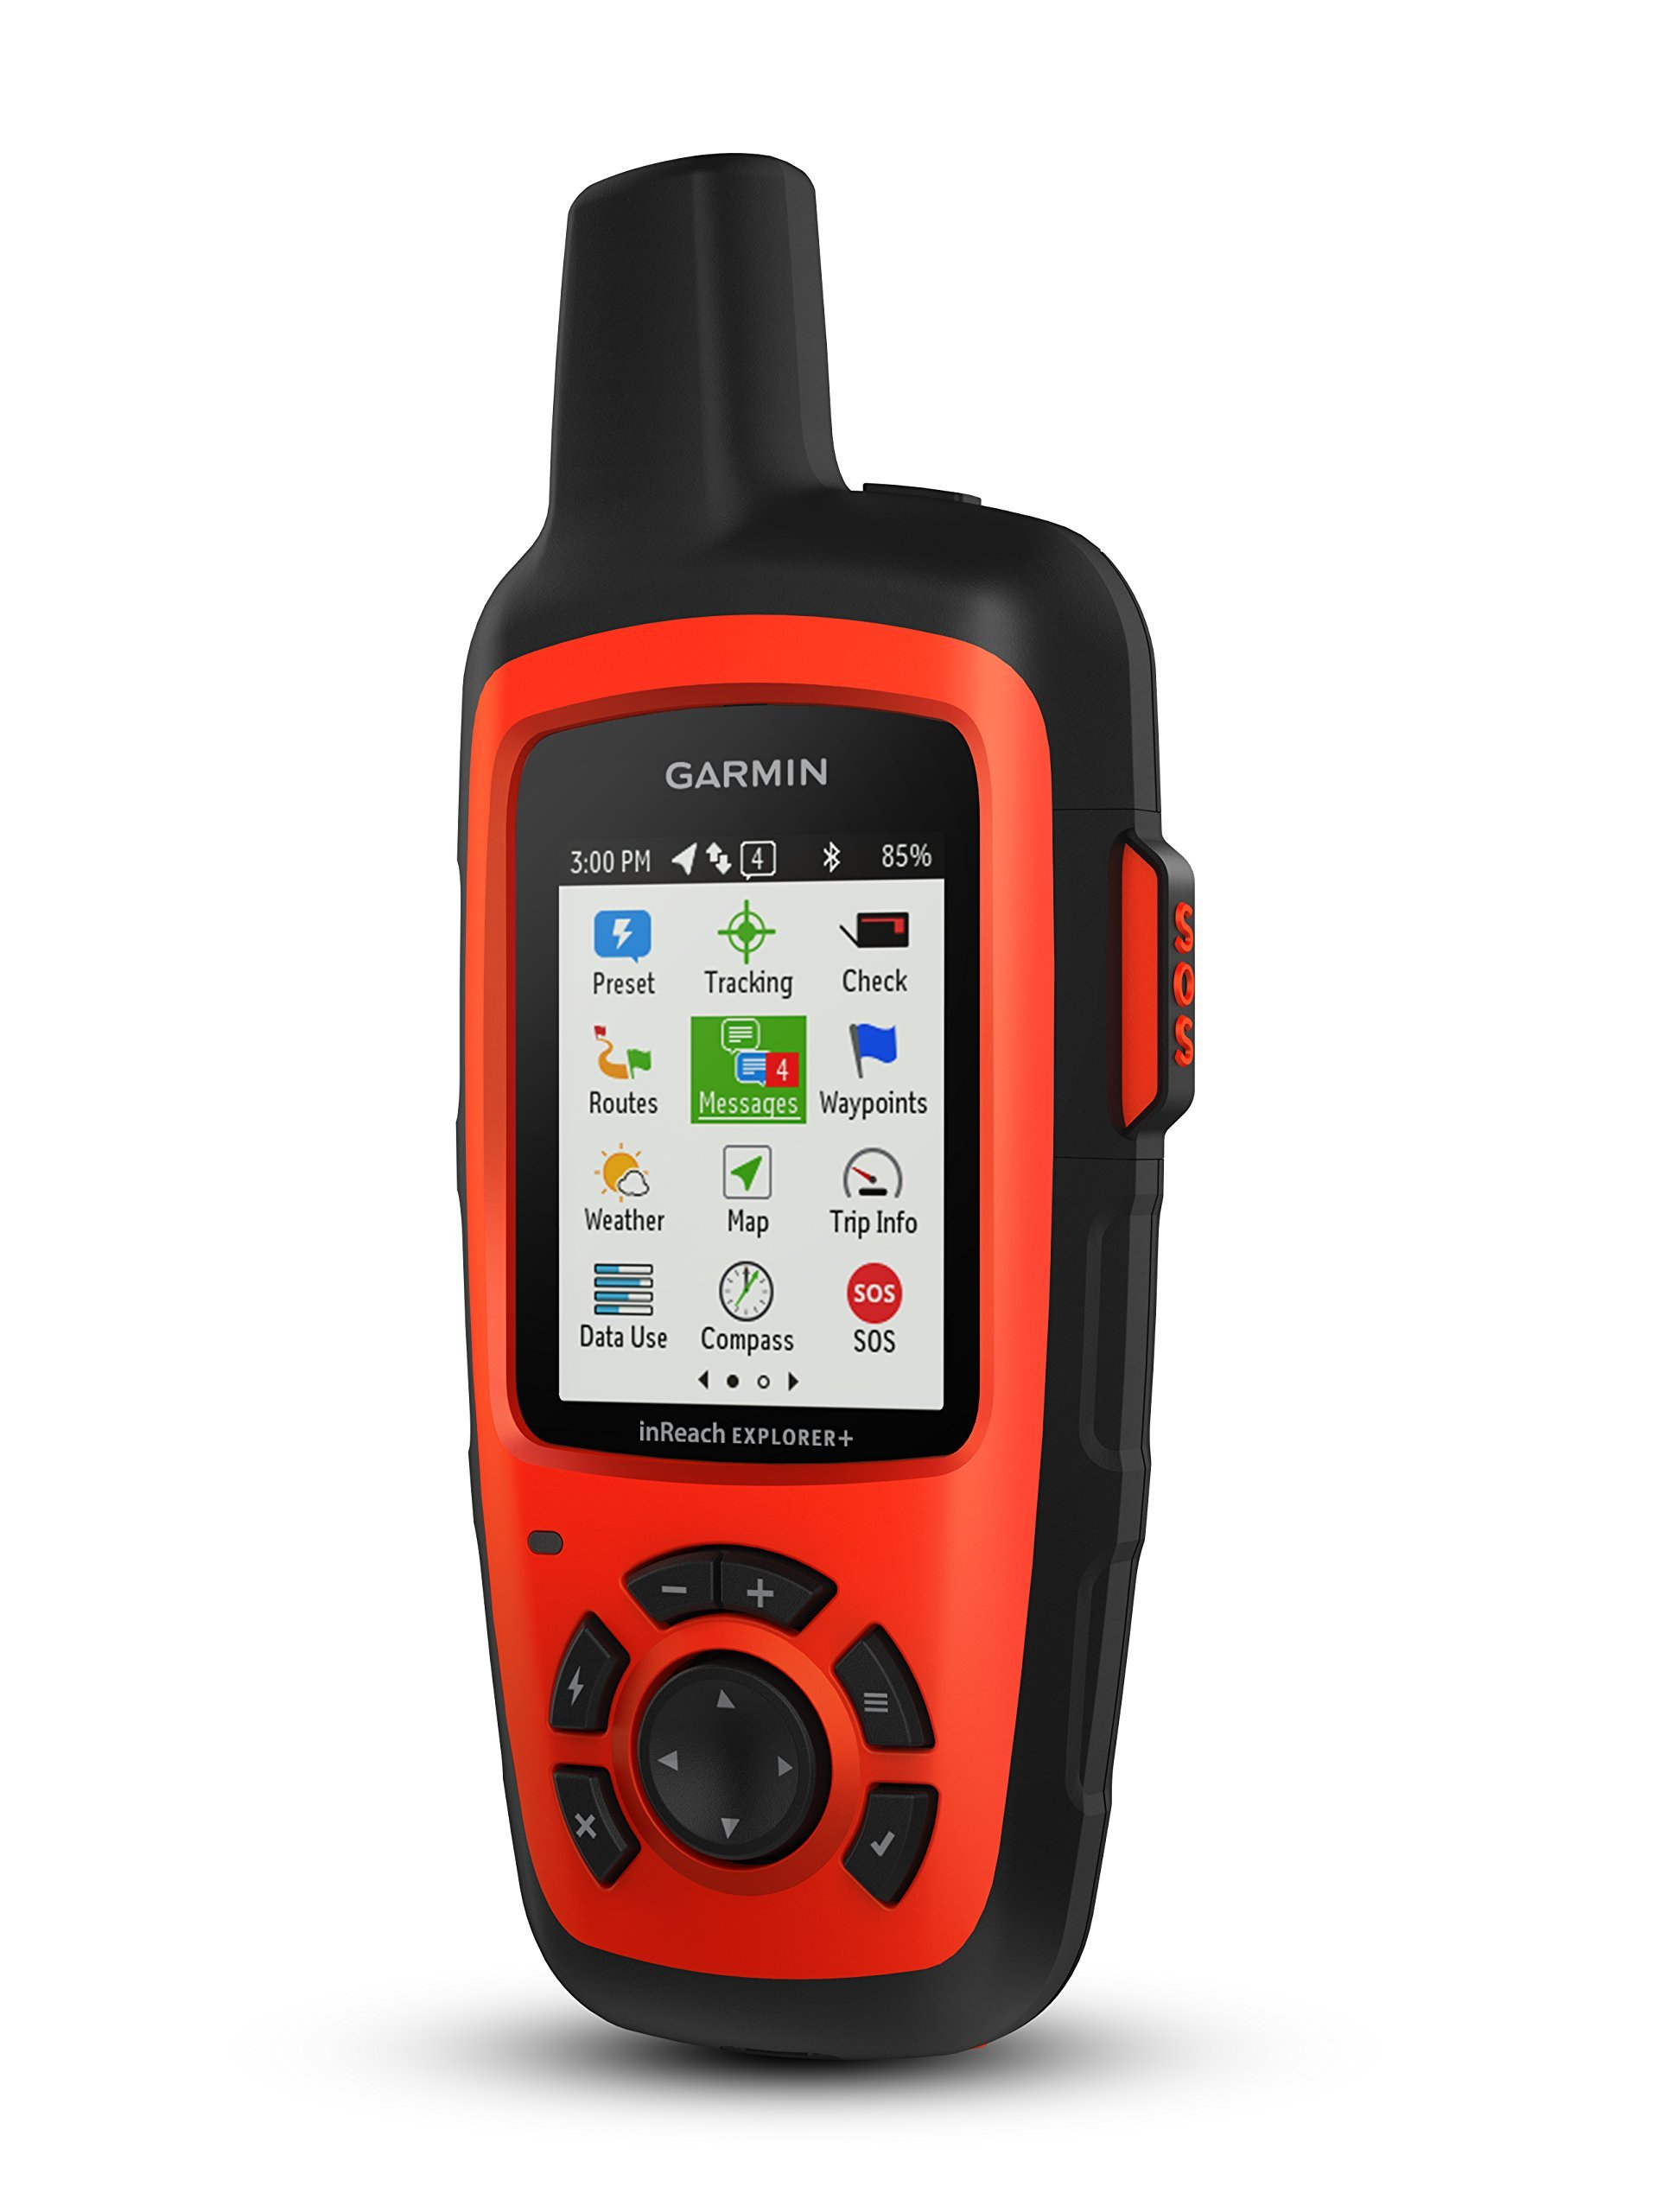 Garmin inReach Explorer+, Handheld Satellite Communicator with TOPO Maps and GPS Navigation (Renewed) by Garmin